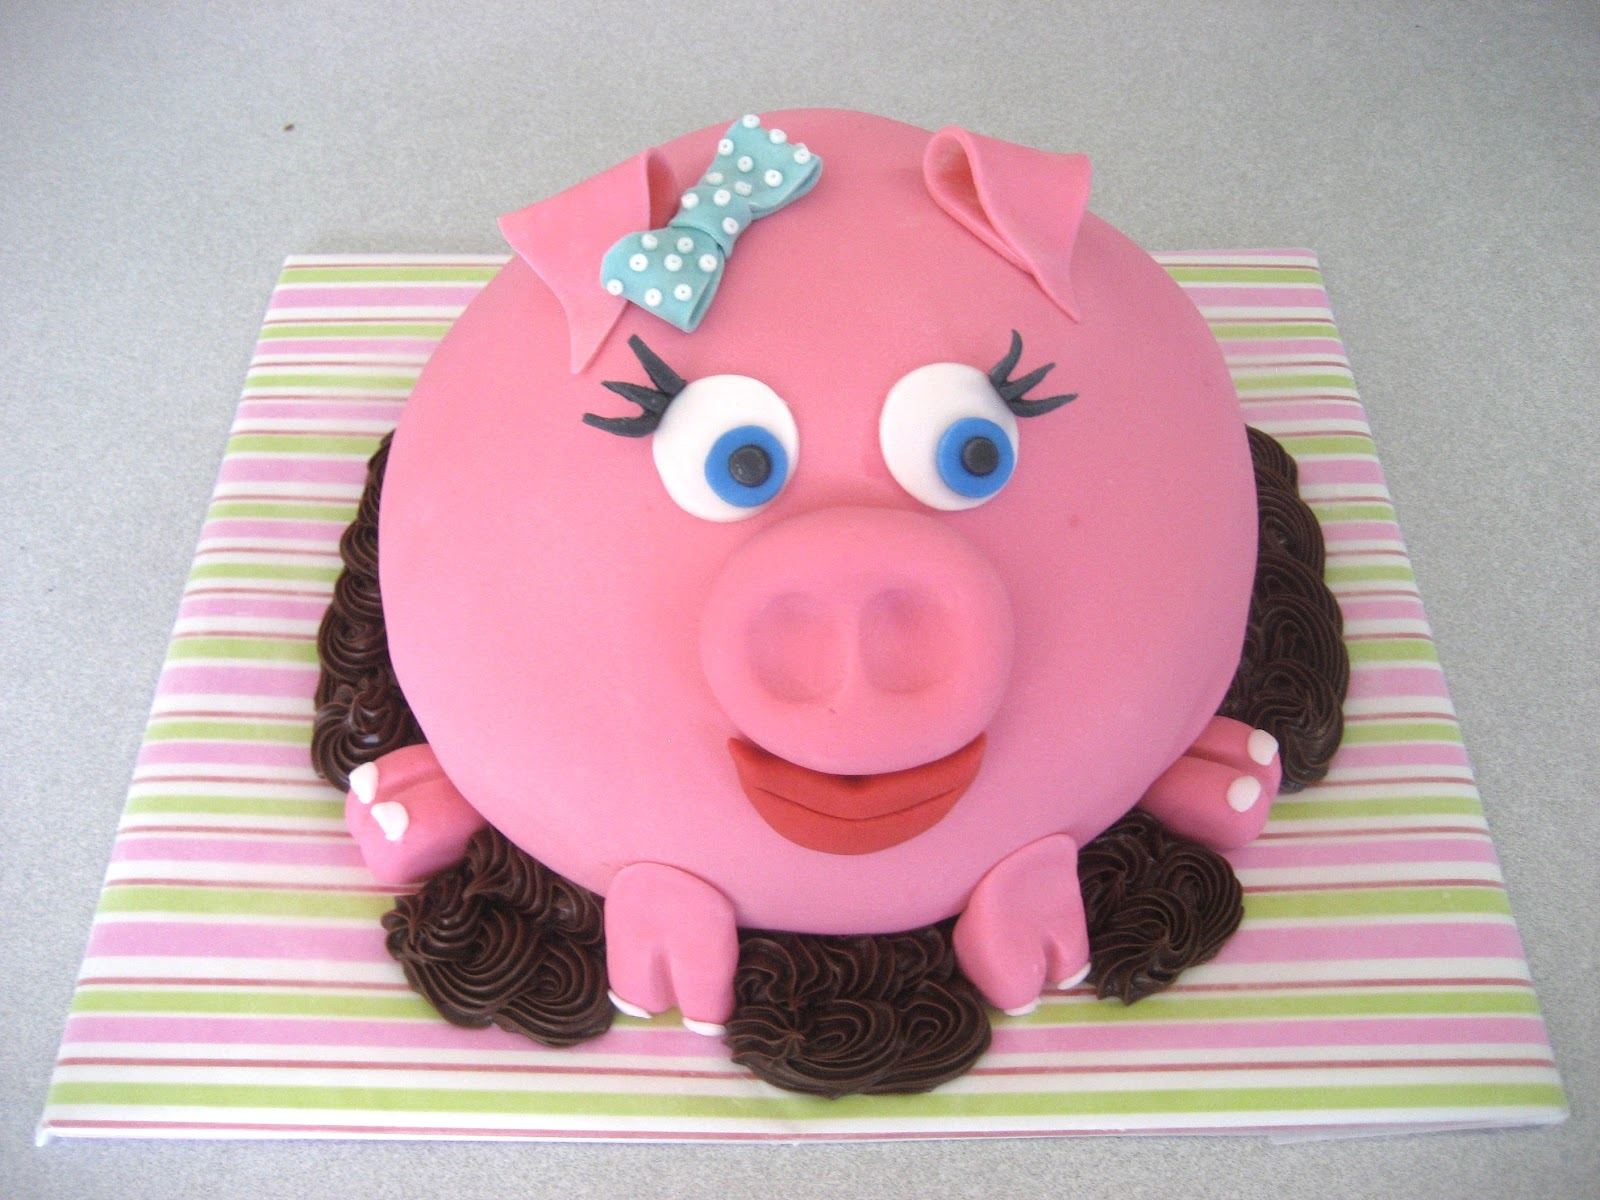 Devanys Designs: Pink Pig Cake